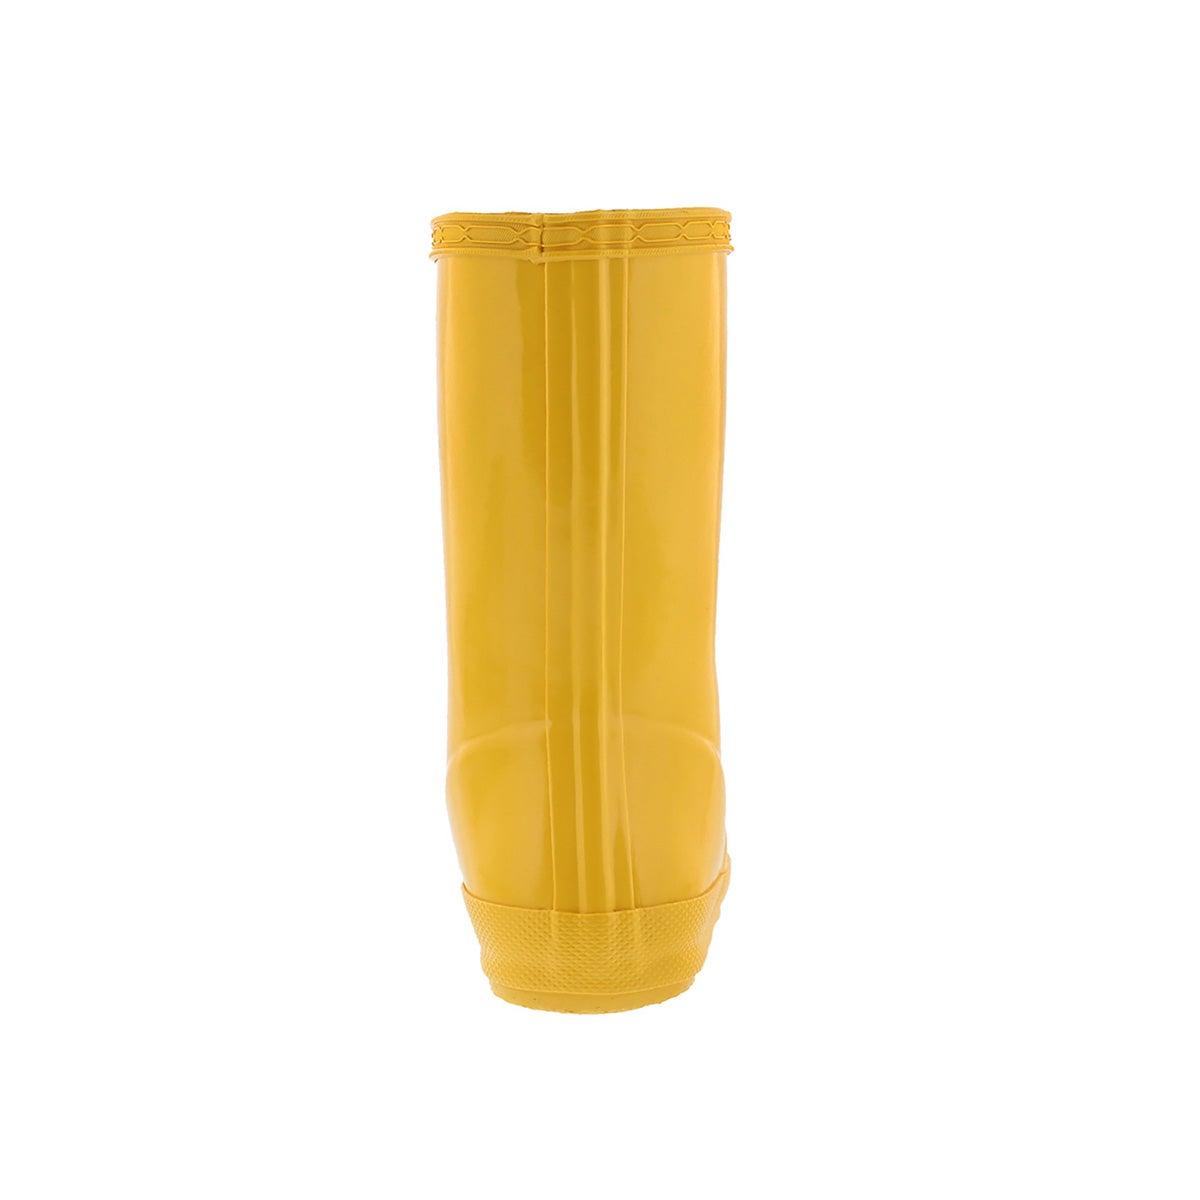 Infs First Classic Gloss yello rain boot